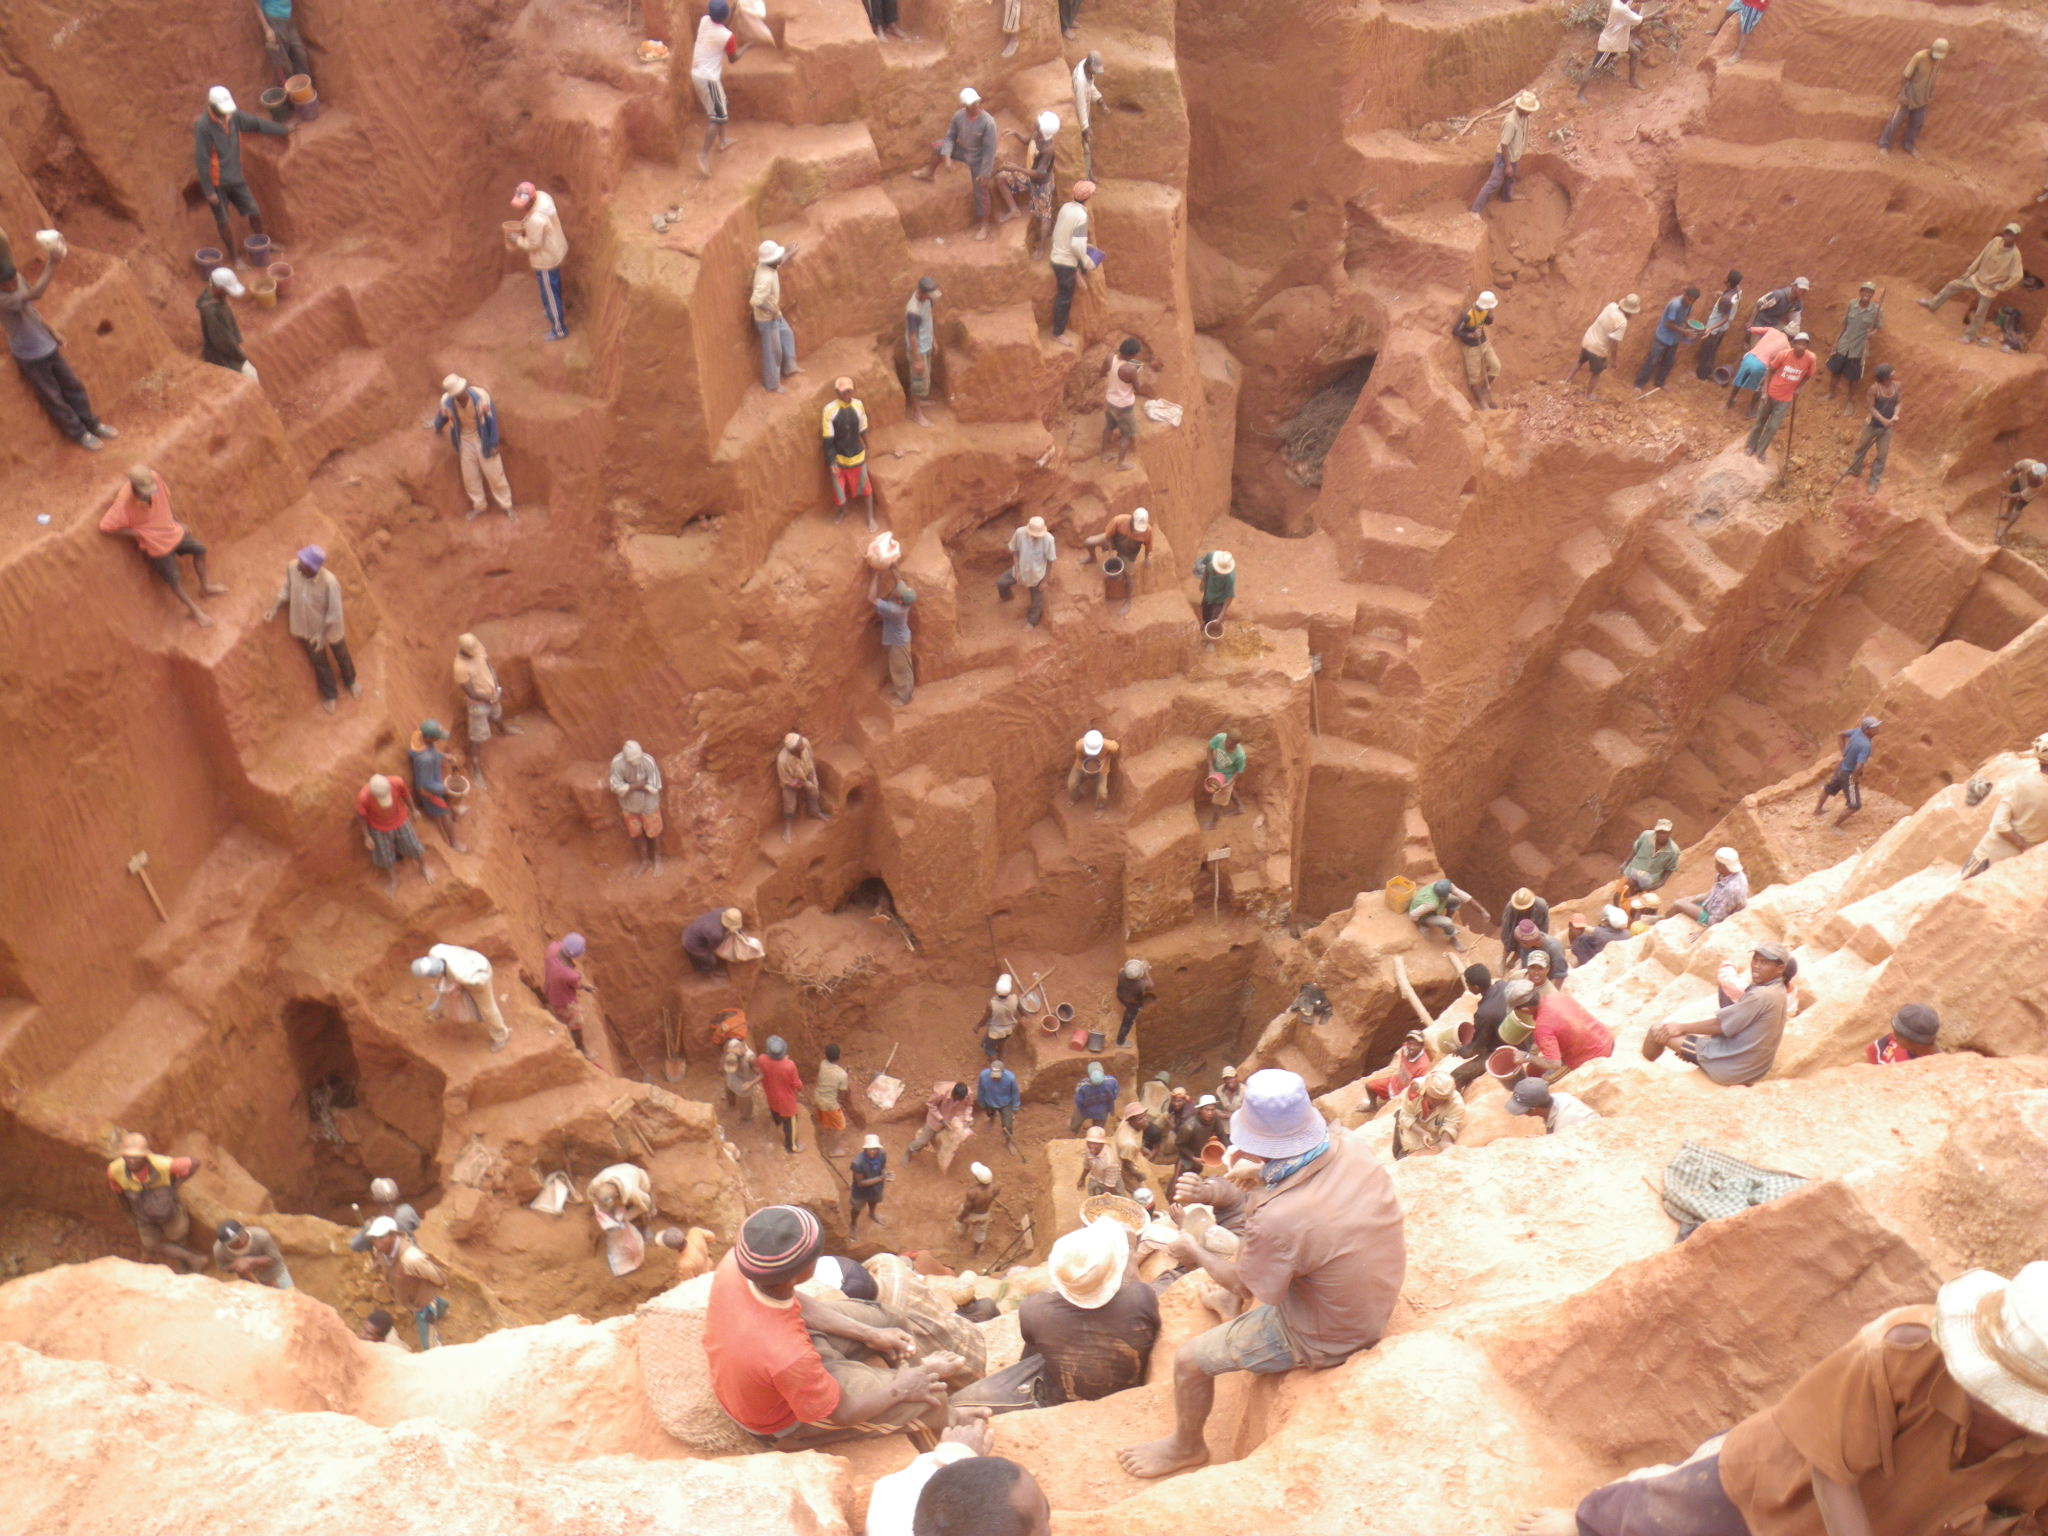 People's Mining Indaba to examine Africa Mining Vision